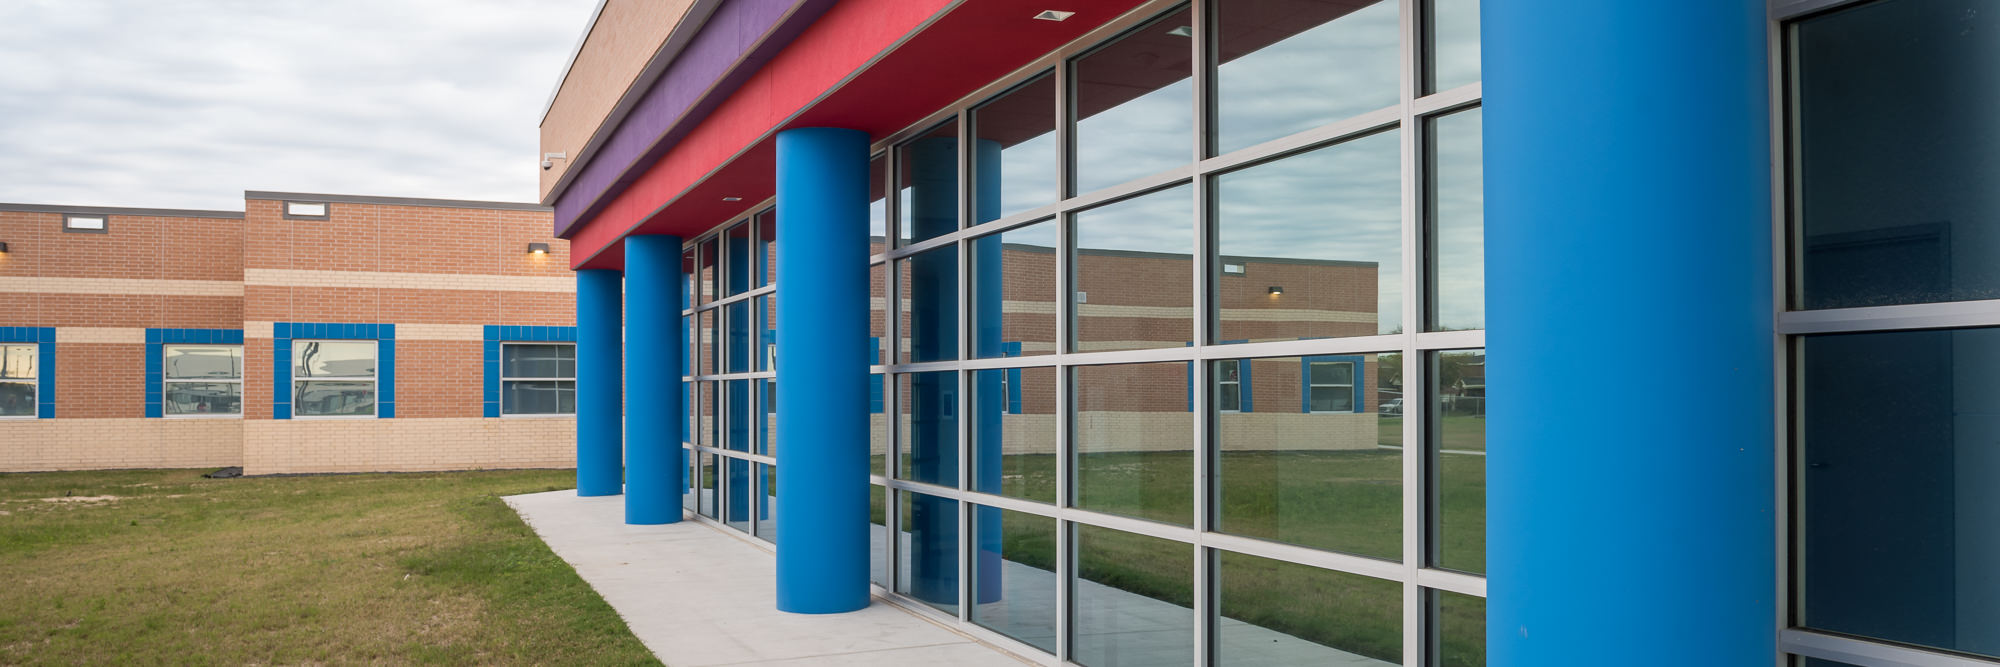 commercial glazing glass houston - school windows